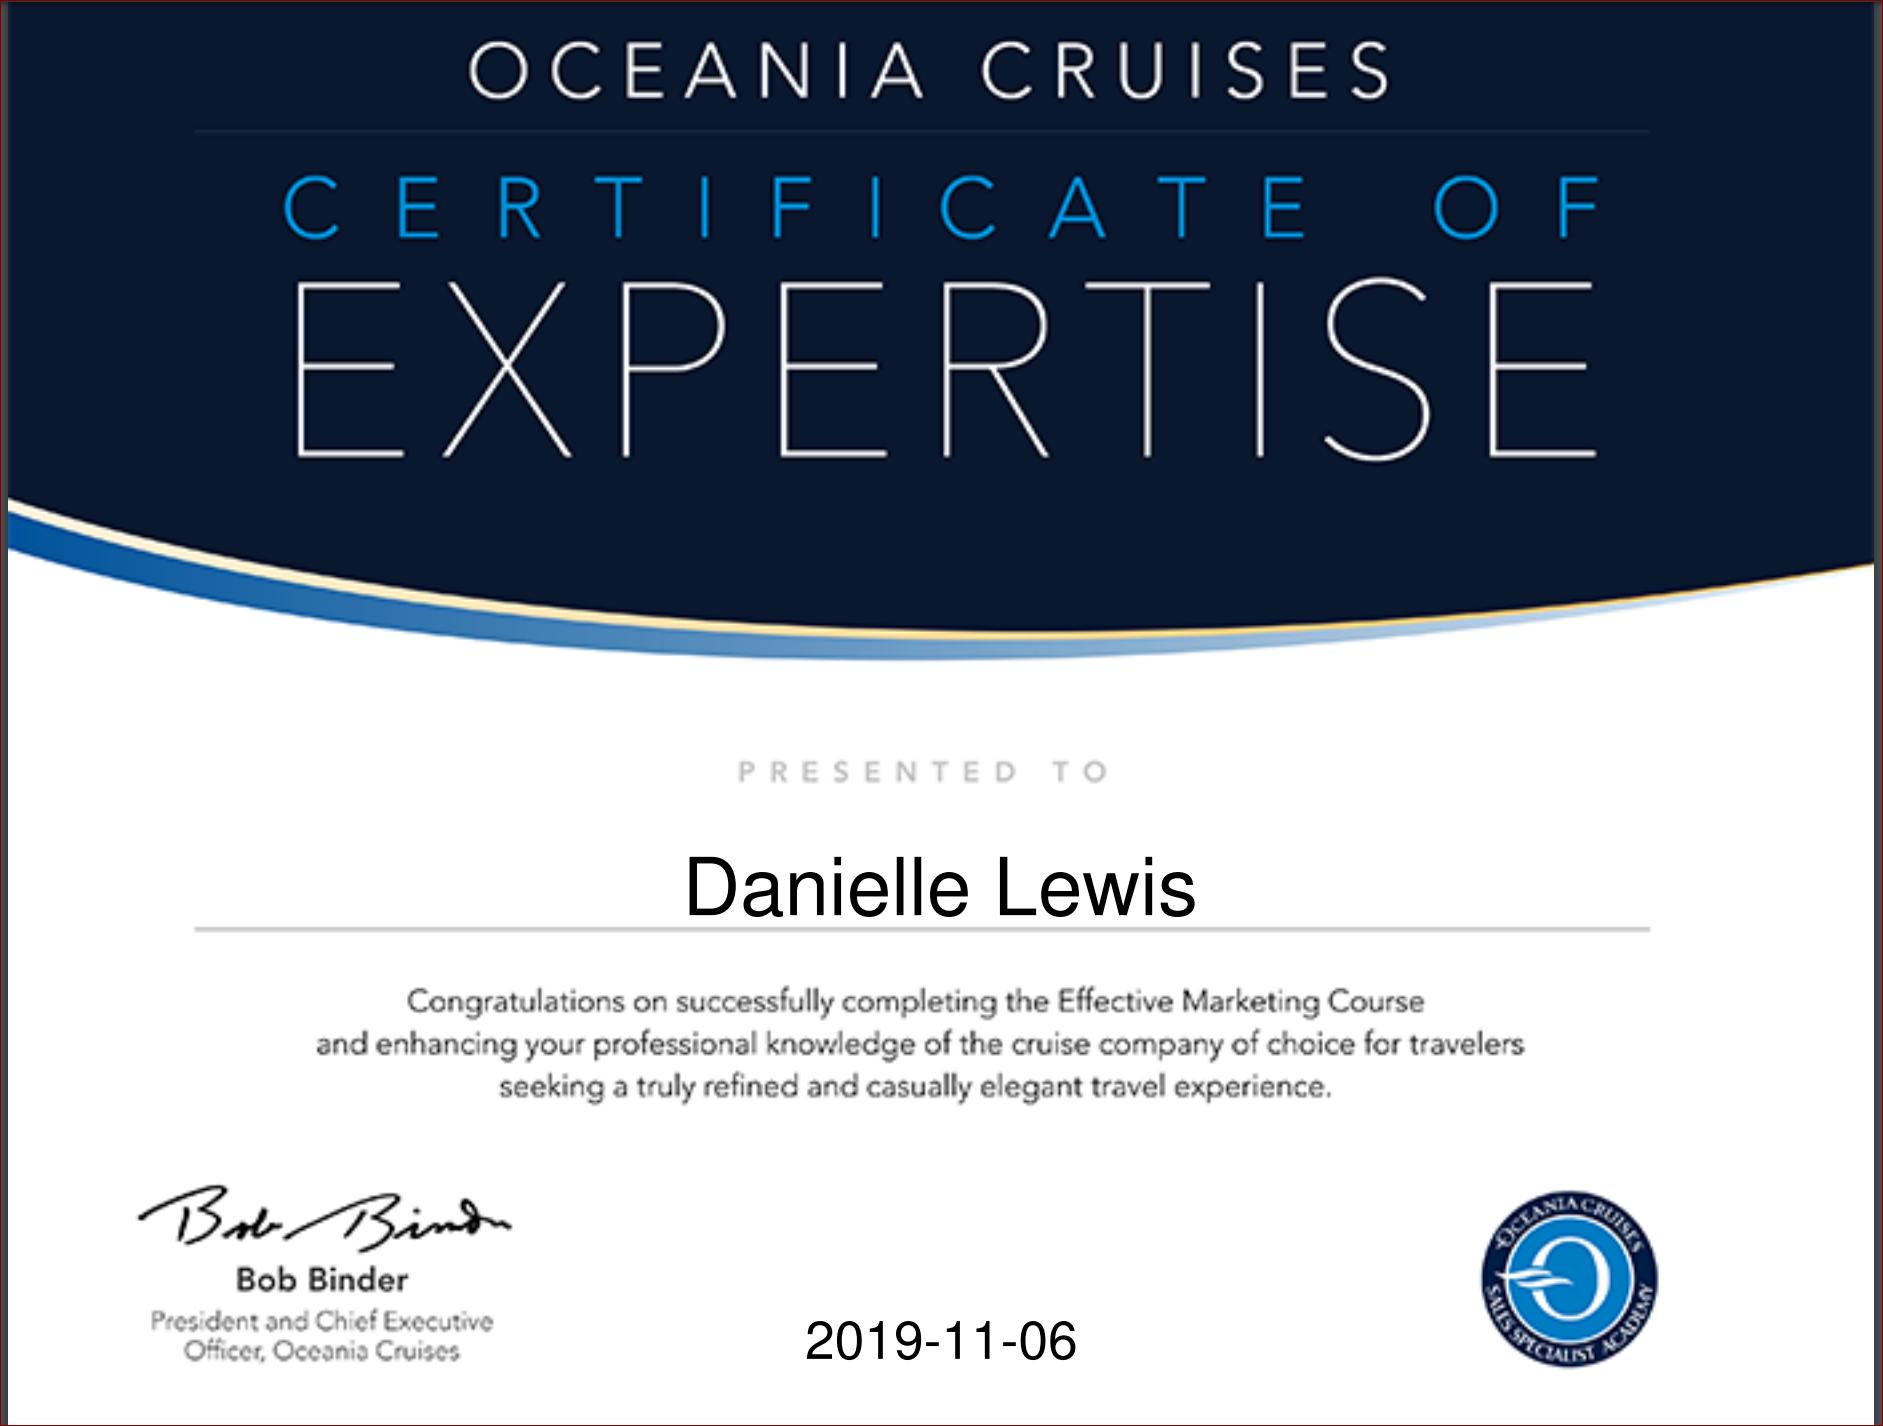 SelfishMe Travel - Oceania Cruises - Effective Marketing Certificate of Expertise